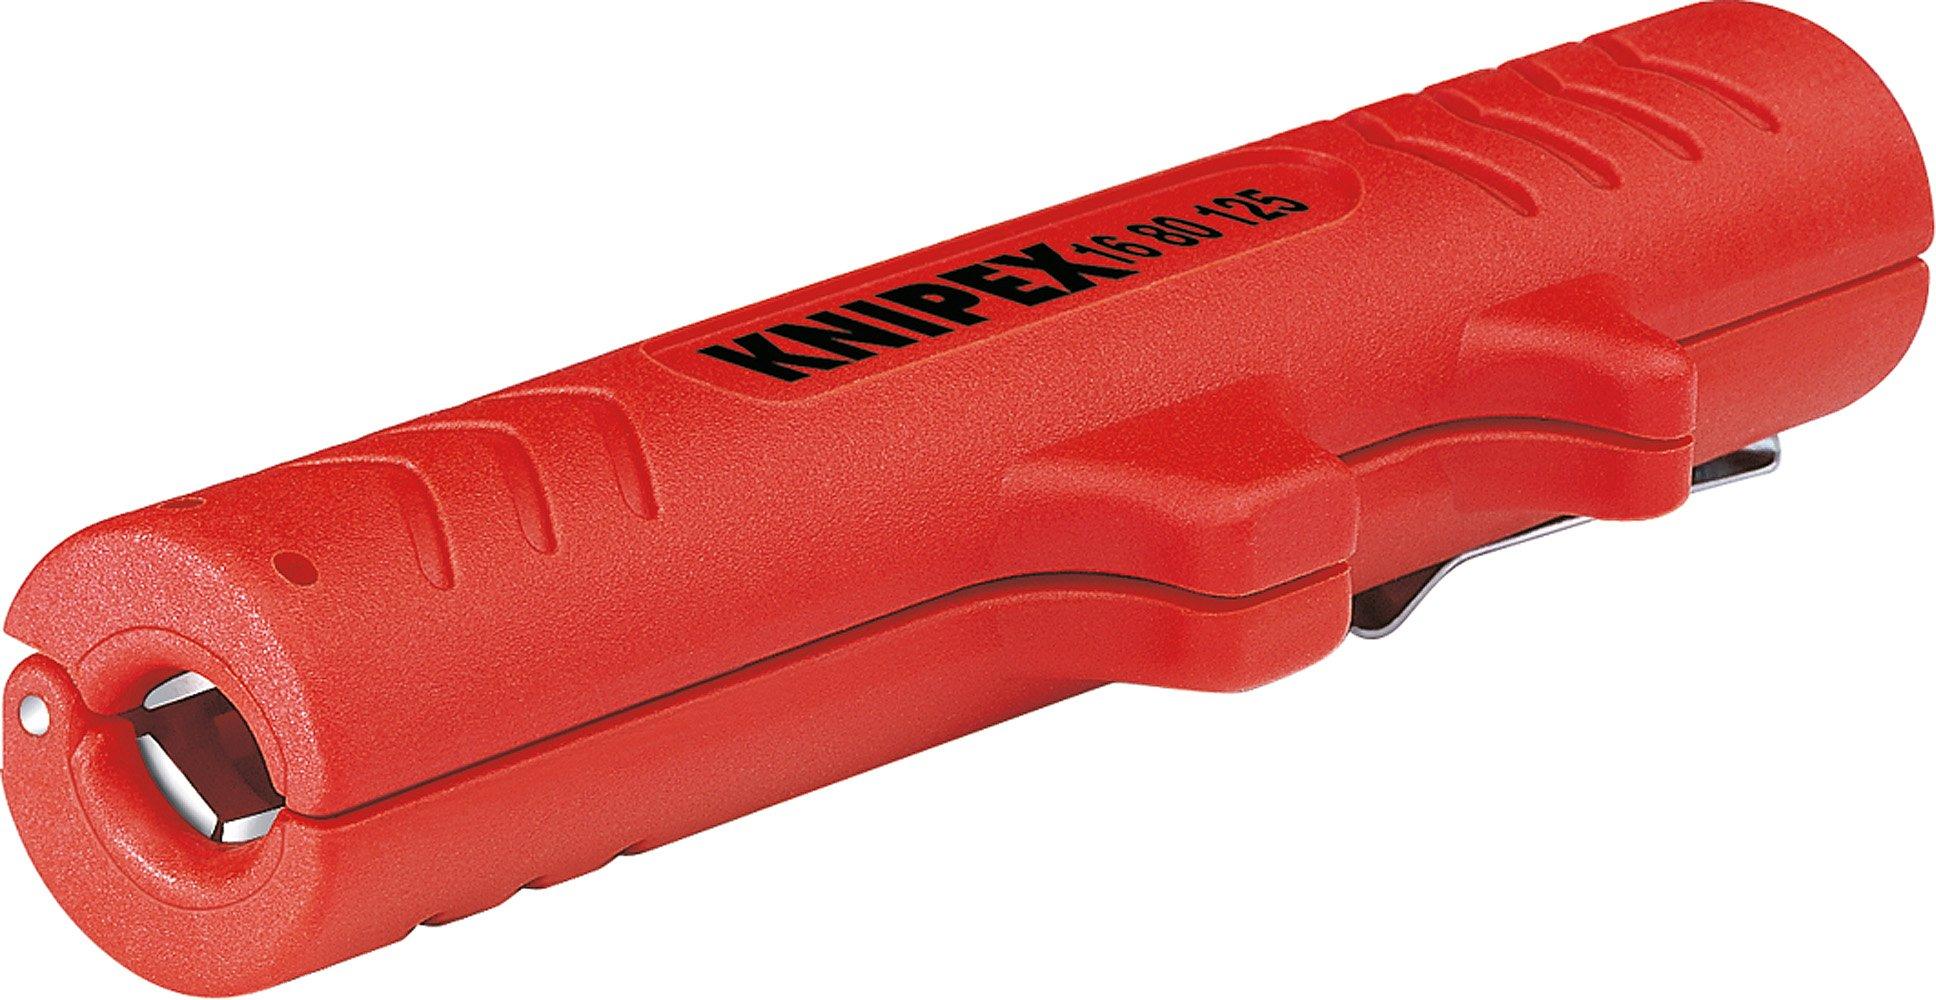 Knipex 16 80 125 SB Universal Dismantling Tool